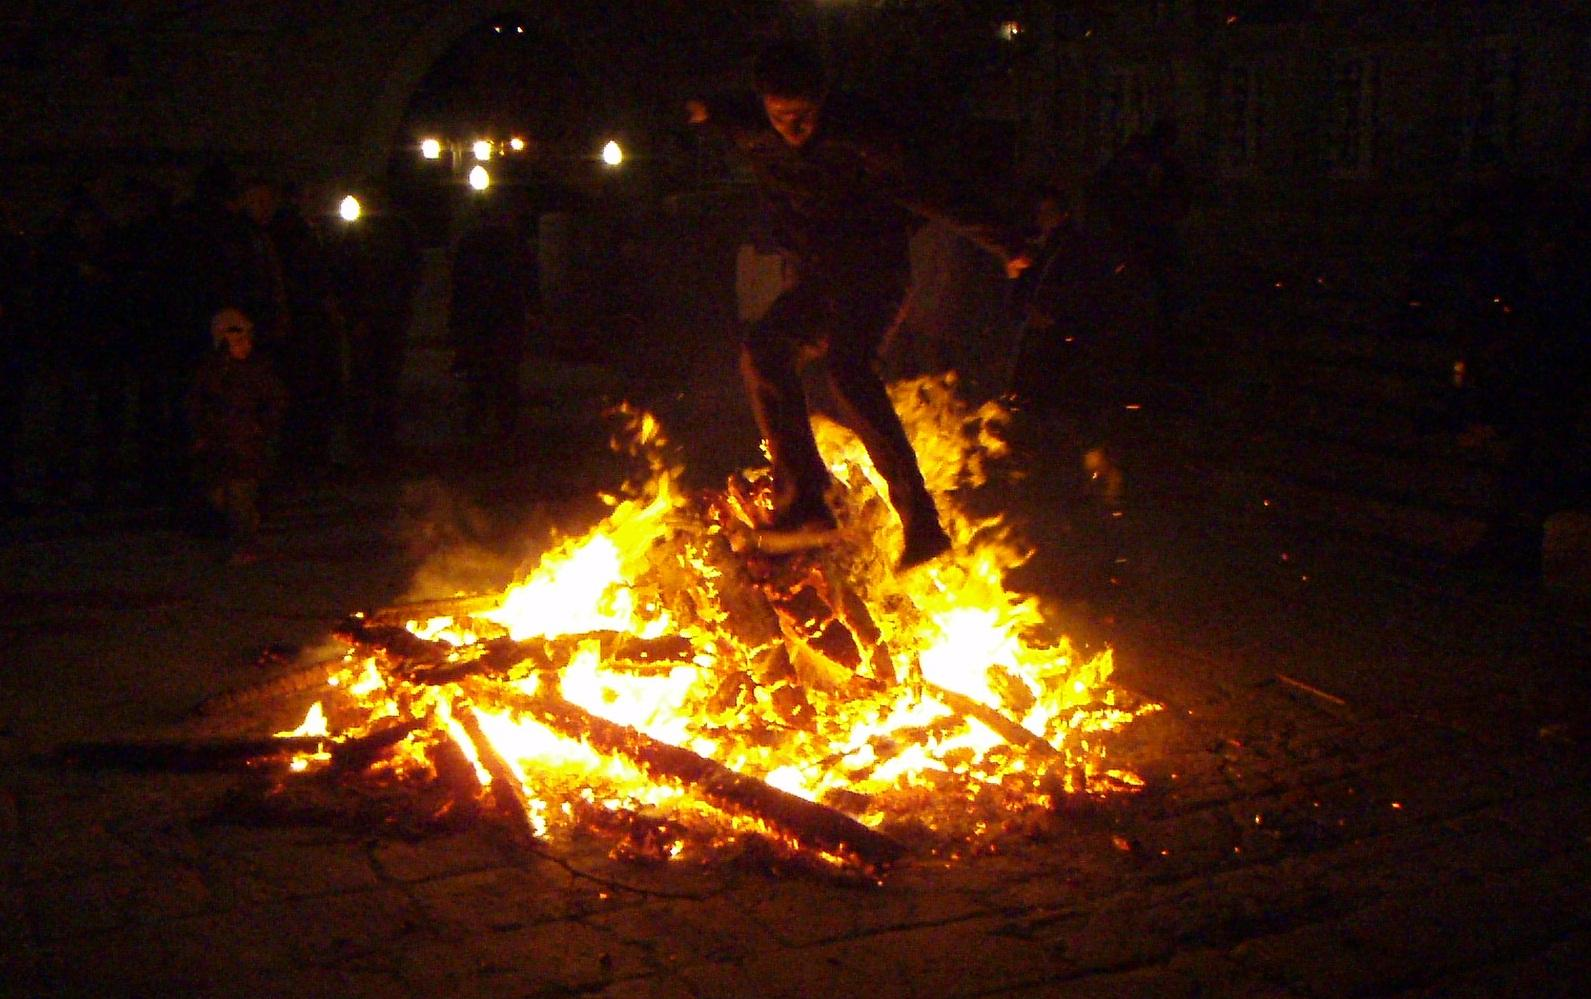 Azerbaijan celebrates Last Tuesday before Novruz